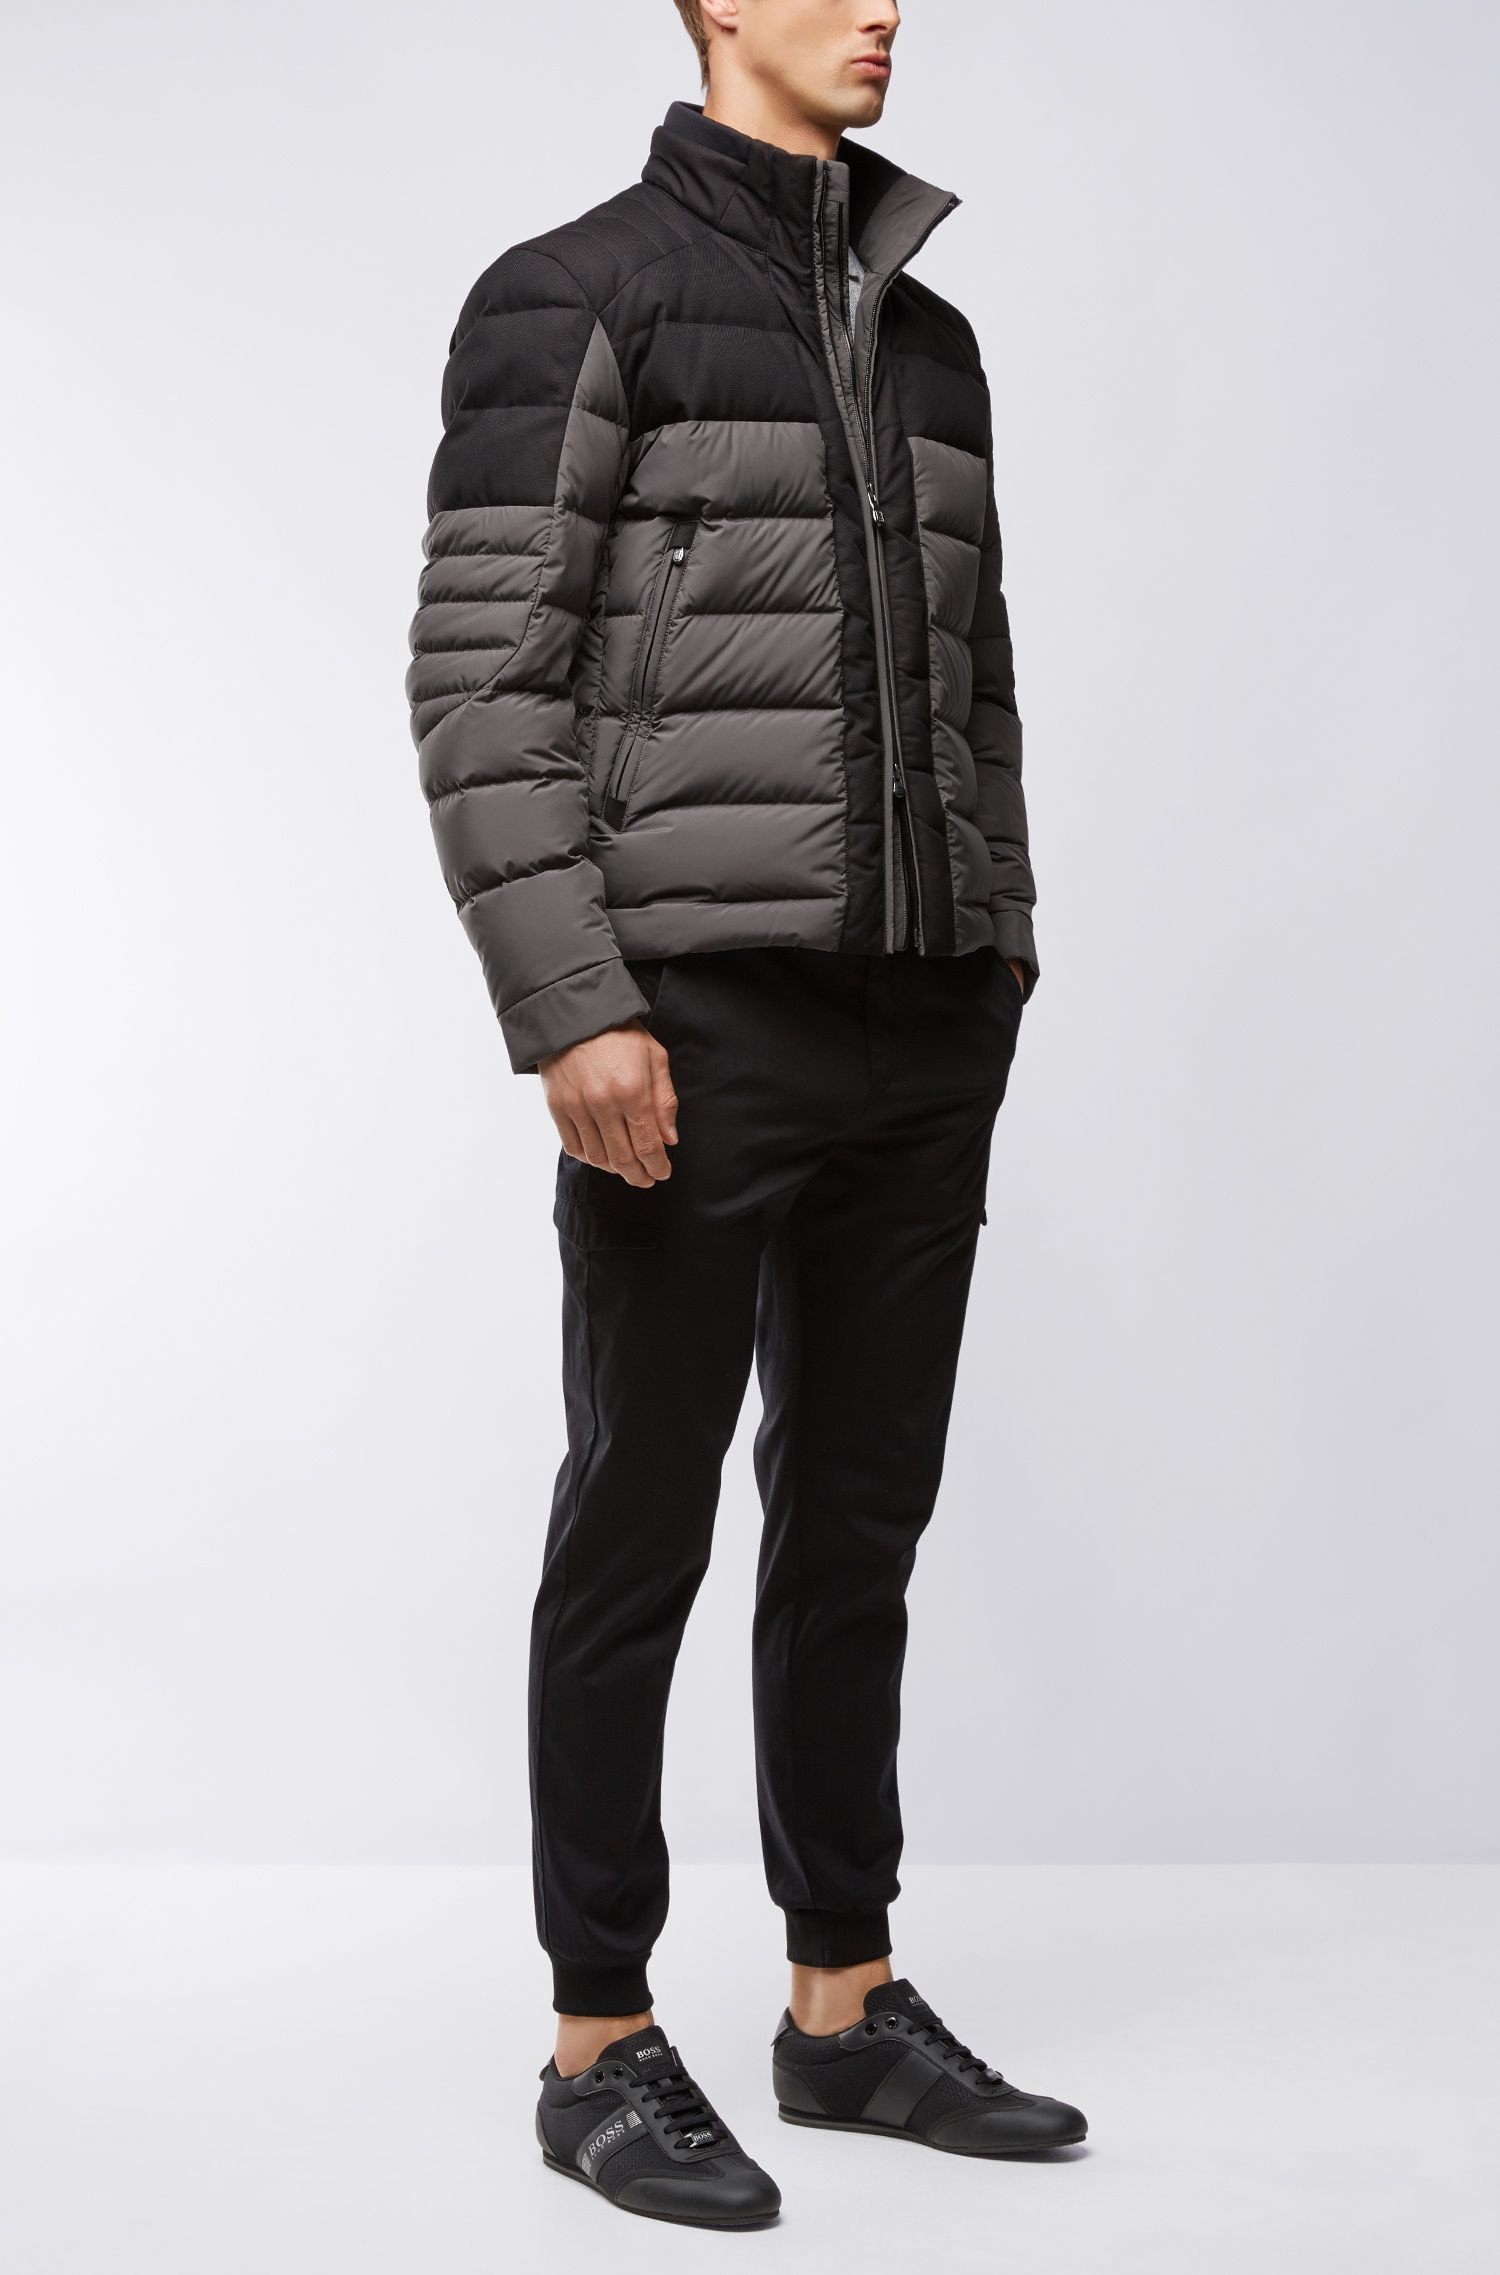 Nylon Quilted Jacket | Jonkins